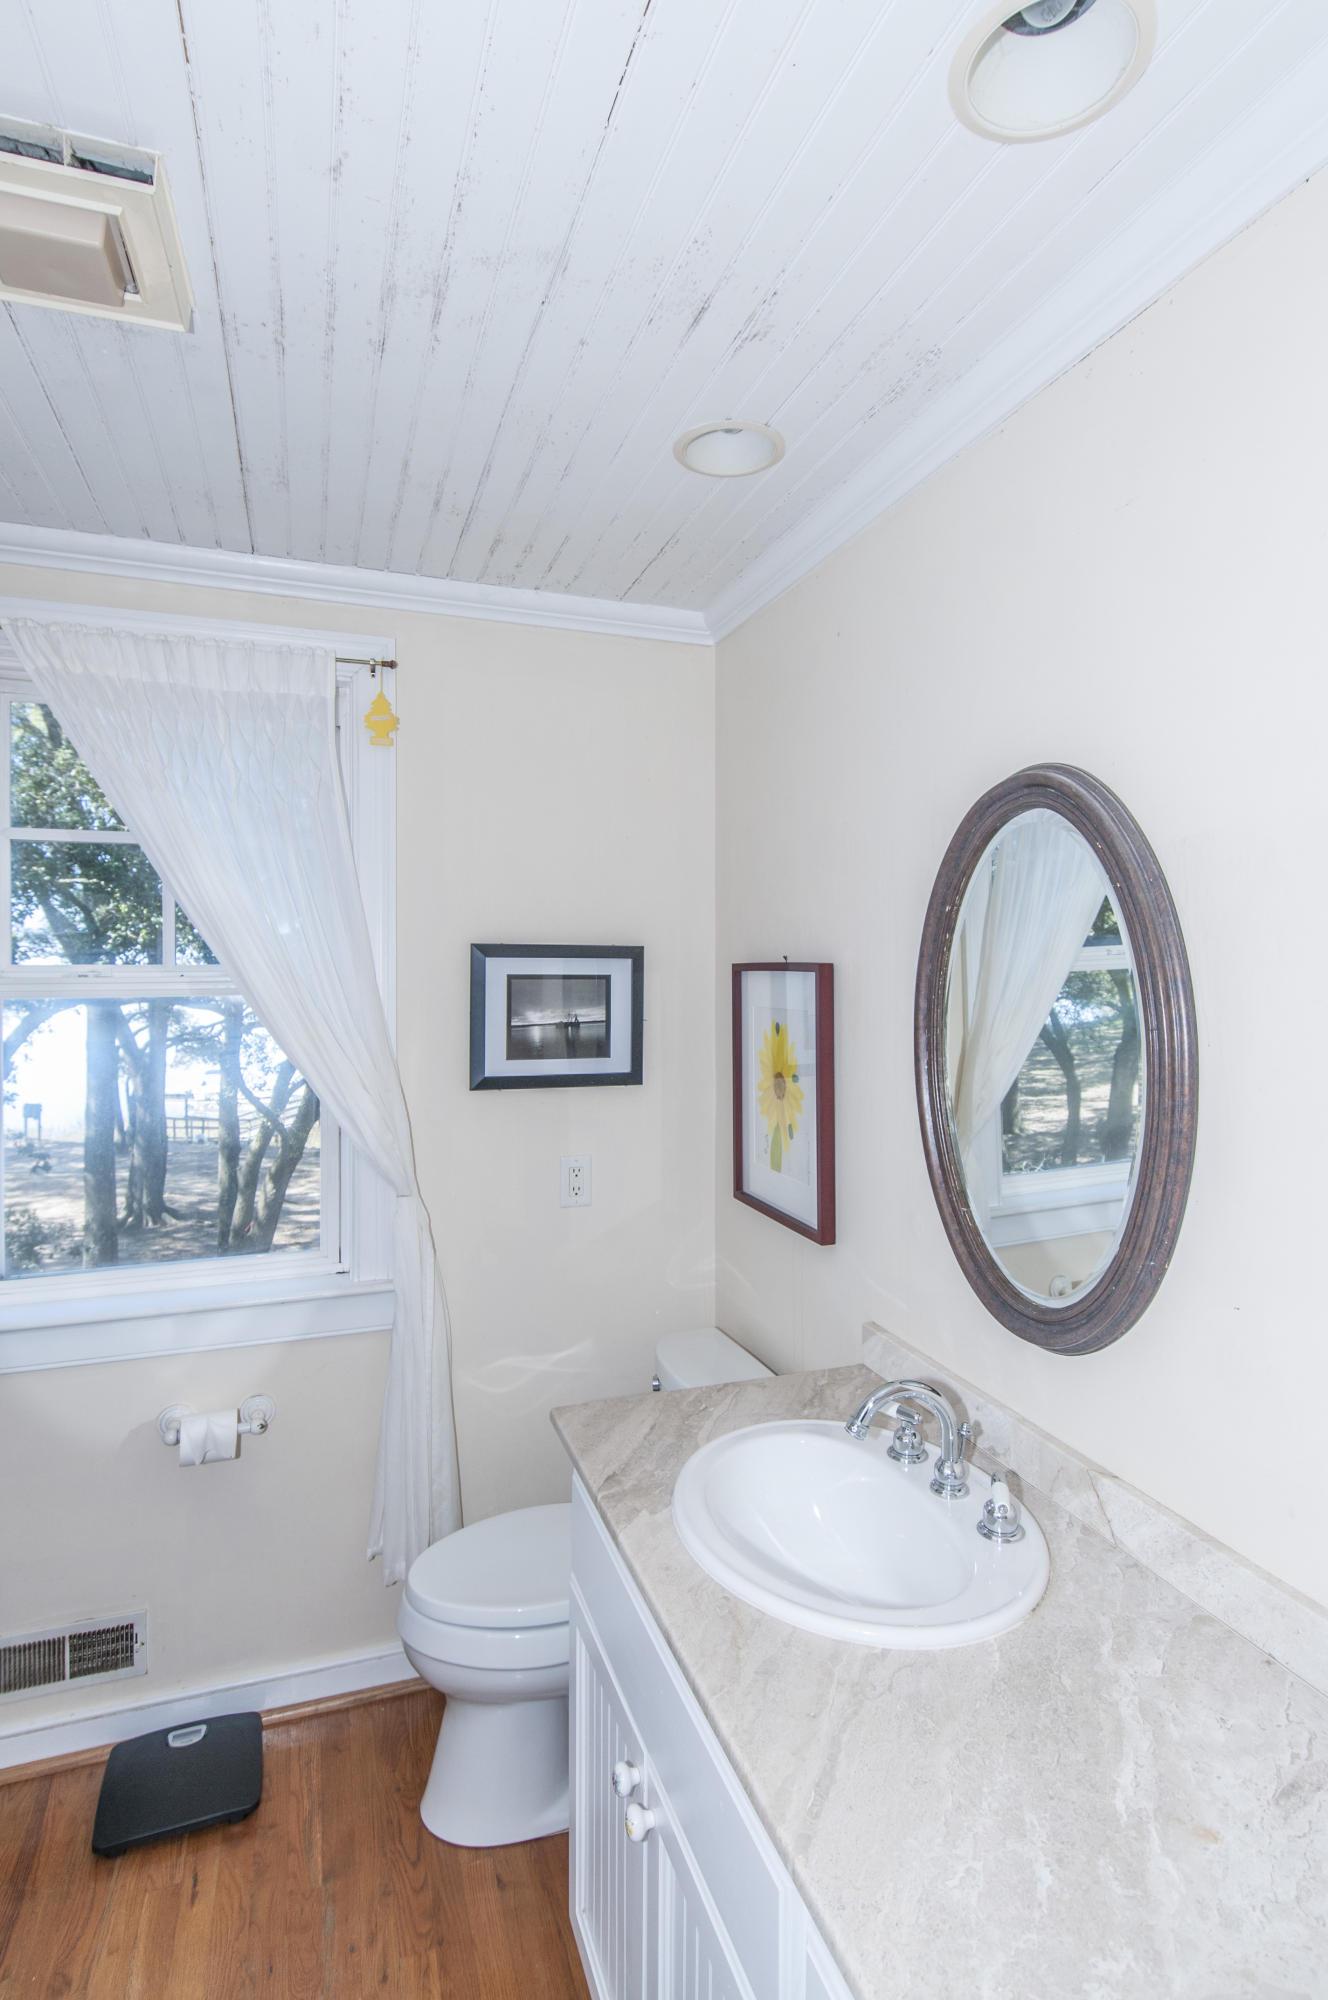 Johns Island Homes For Sale - 4460 Betsy Kerrison, Johns Island, SC - 56